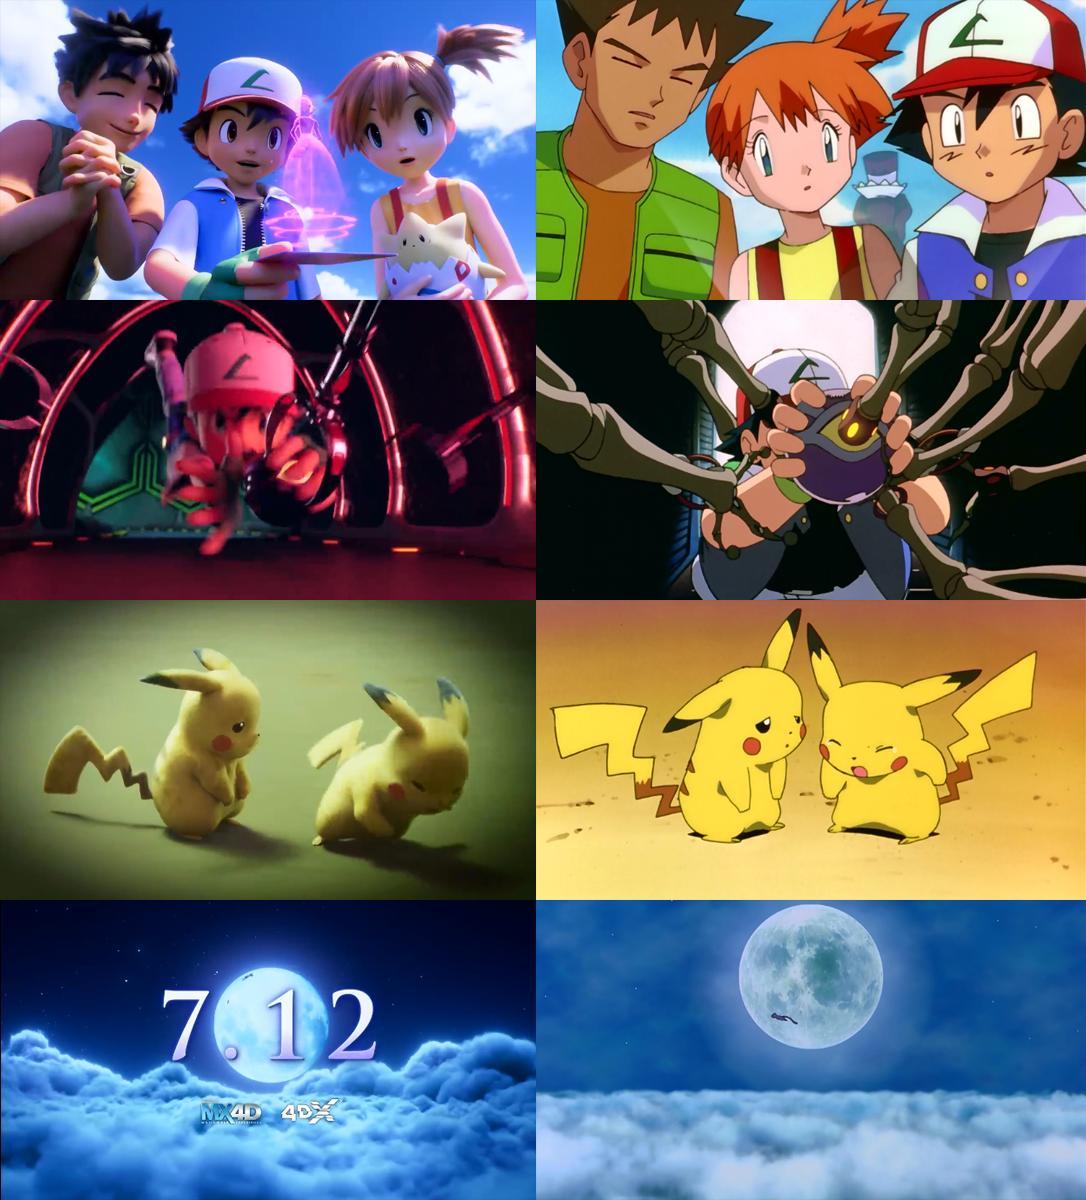 La película Pokémon Mewtwo Strikes Back: Evolution presenta un nuevo tráiler